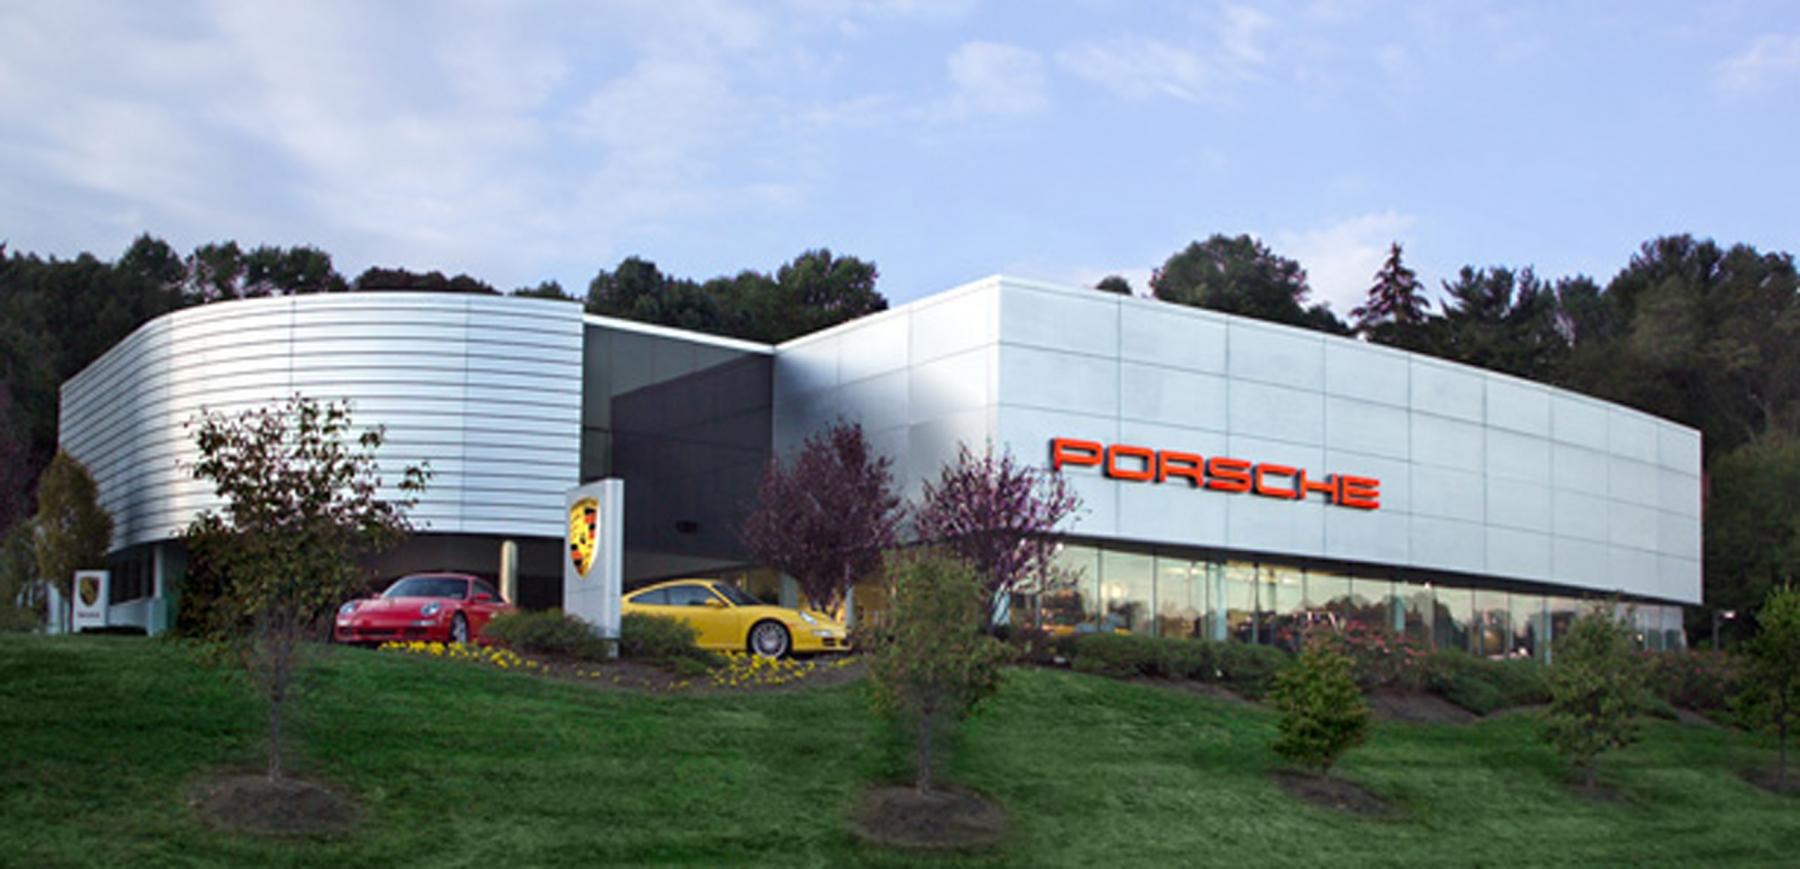 Porsche, Newtown Square PA